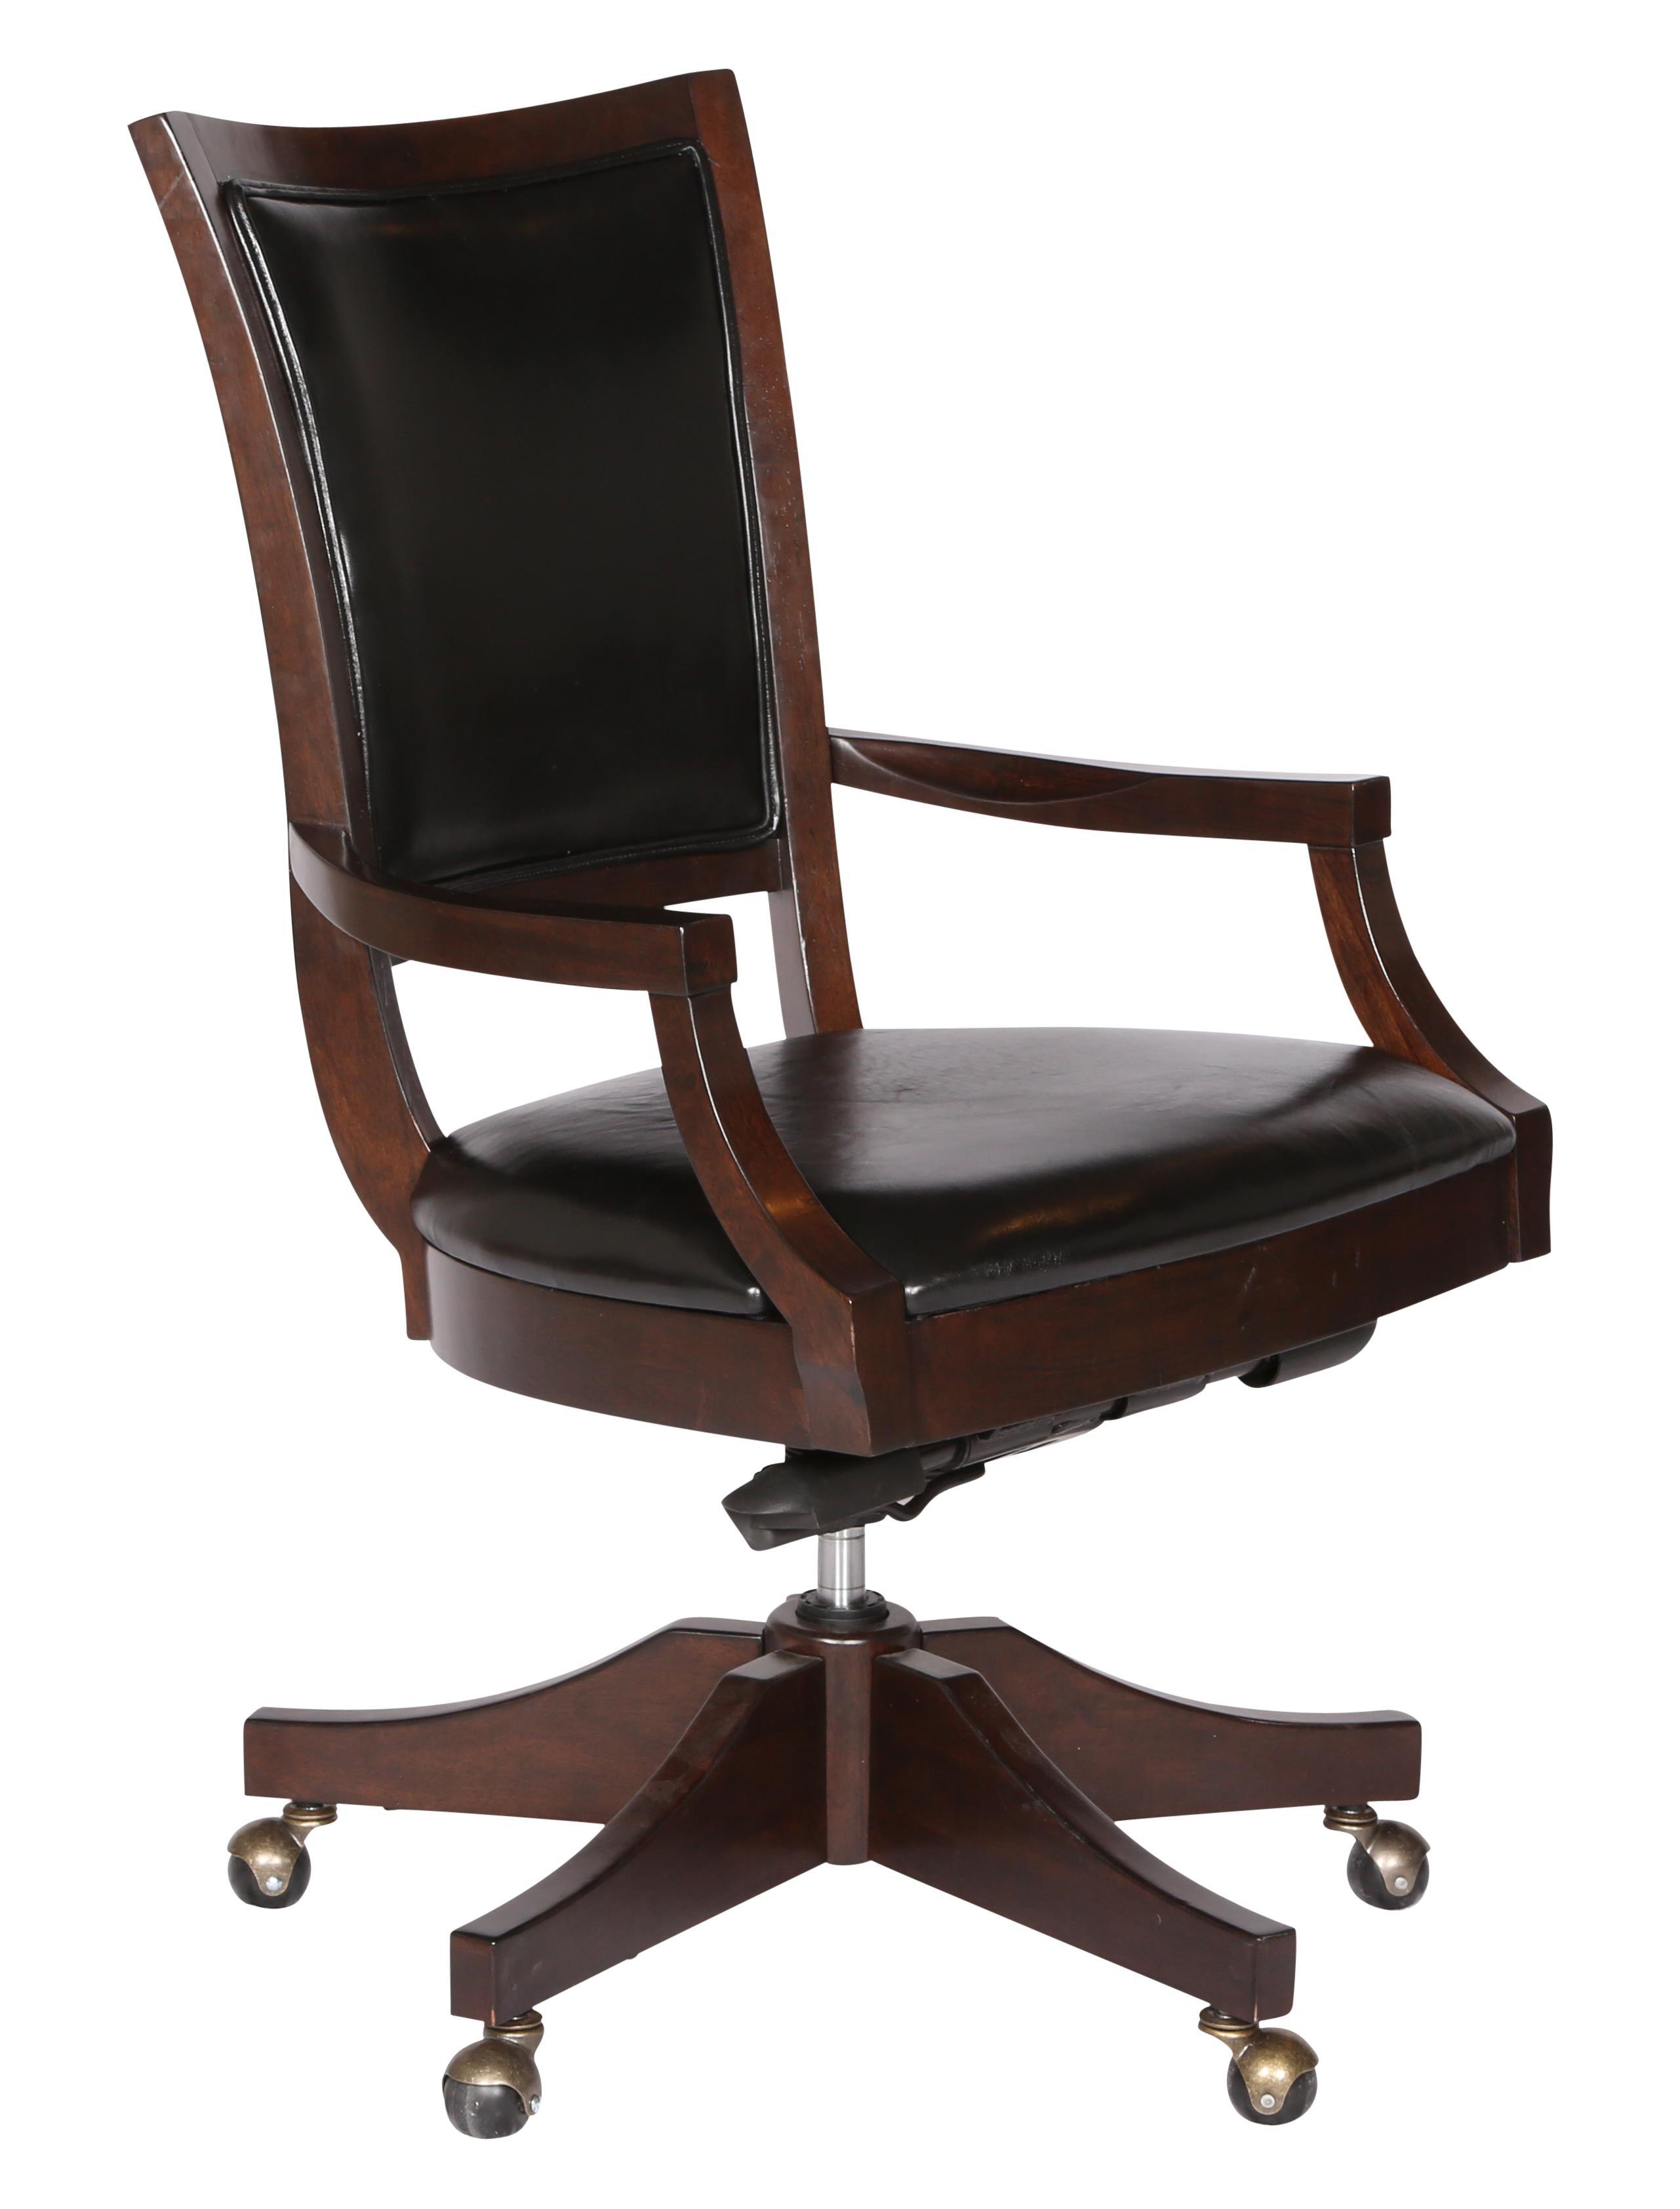 Magnussen Home Fuqua Swivel Desk Chair - Item Number: H1794-83